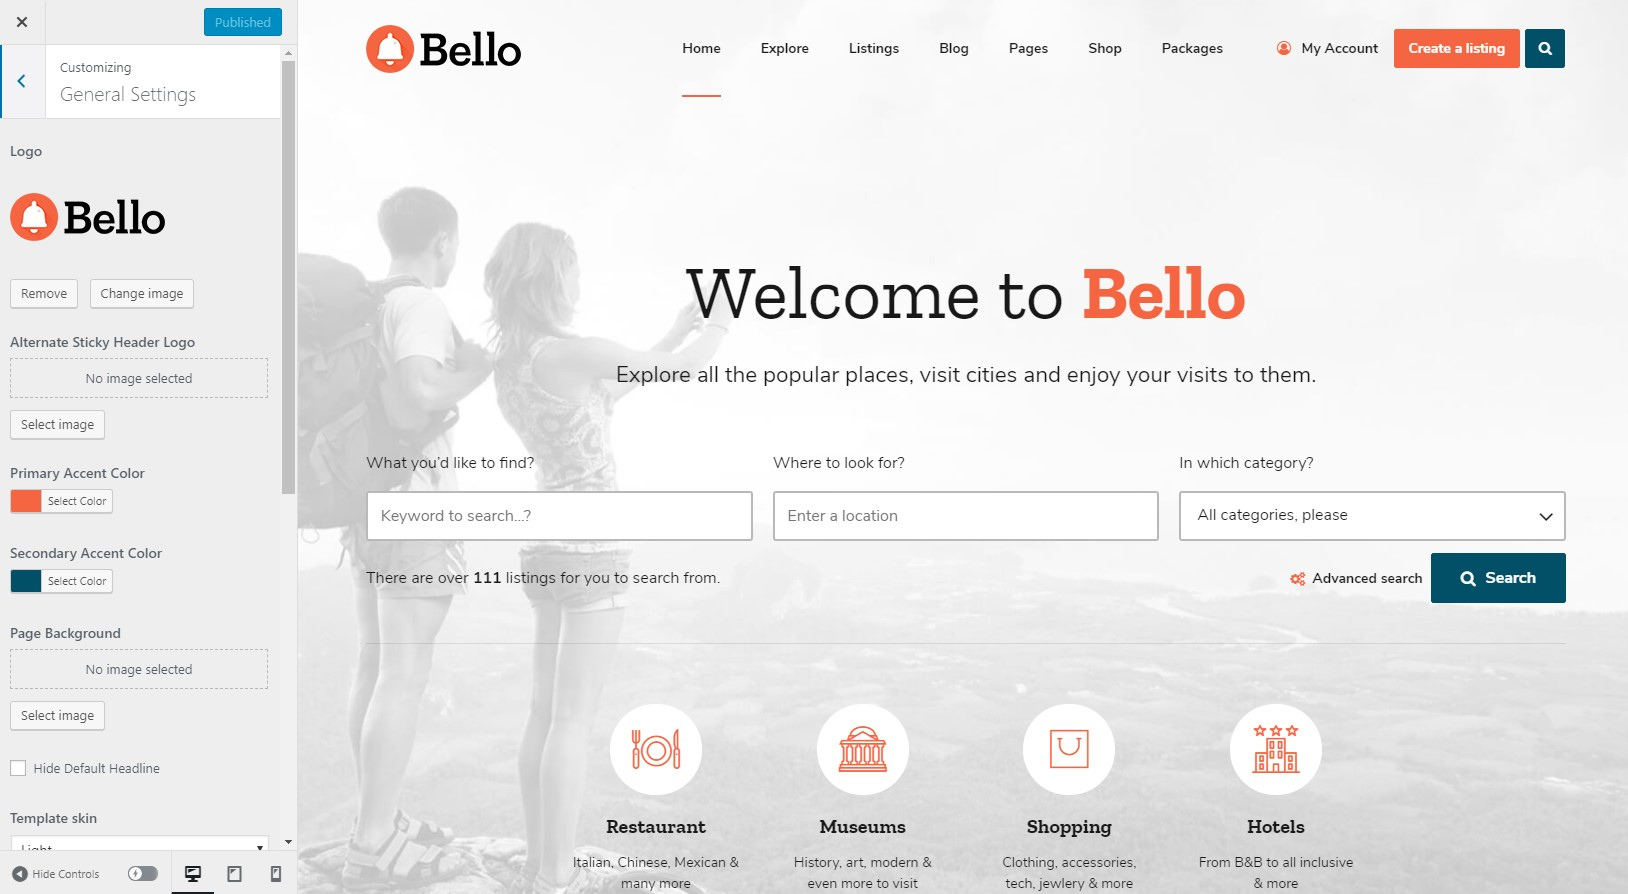 https://documentation.bold-themes.com/bello/wp-content/uploads/sites/31/2018/03/general-settings.jpg